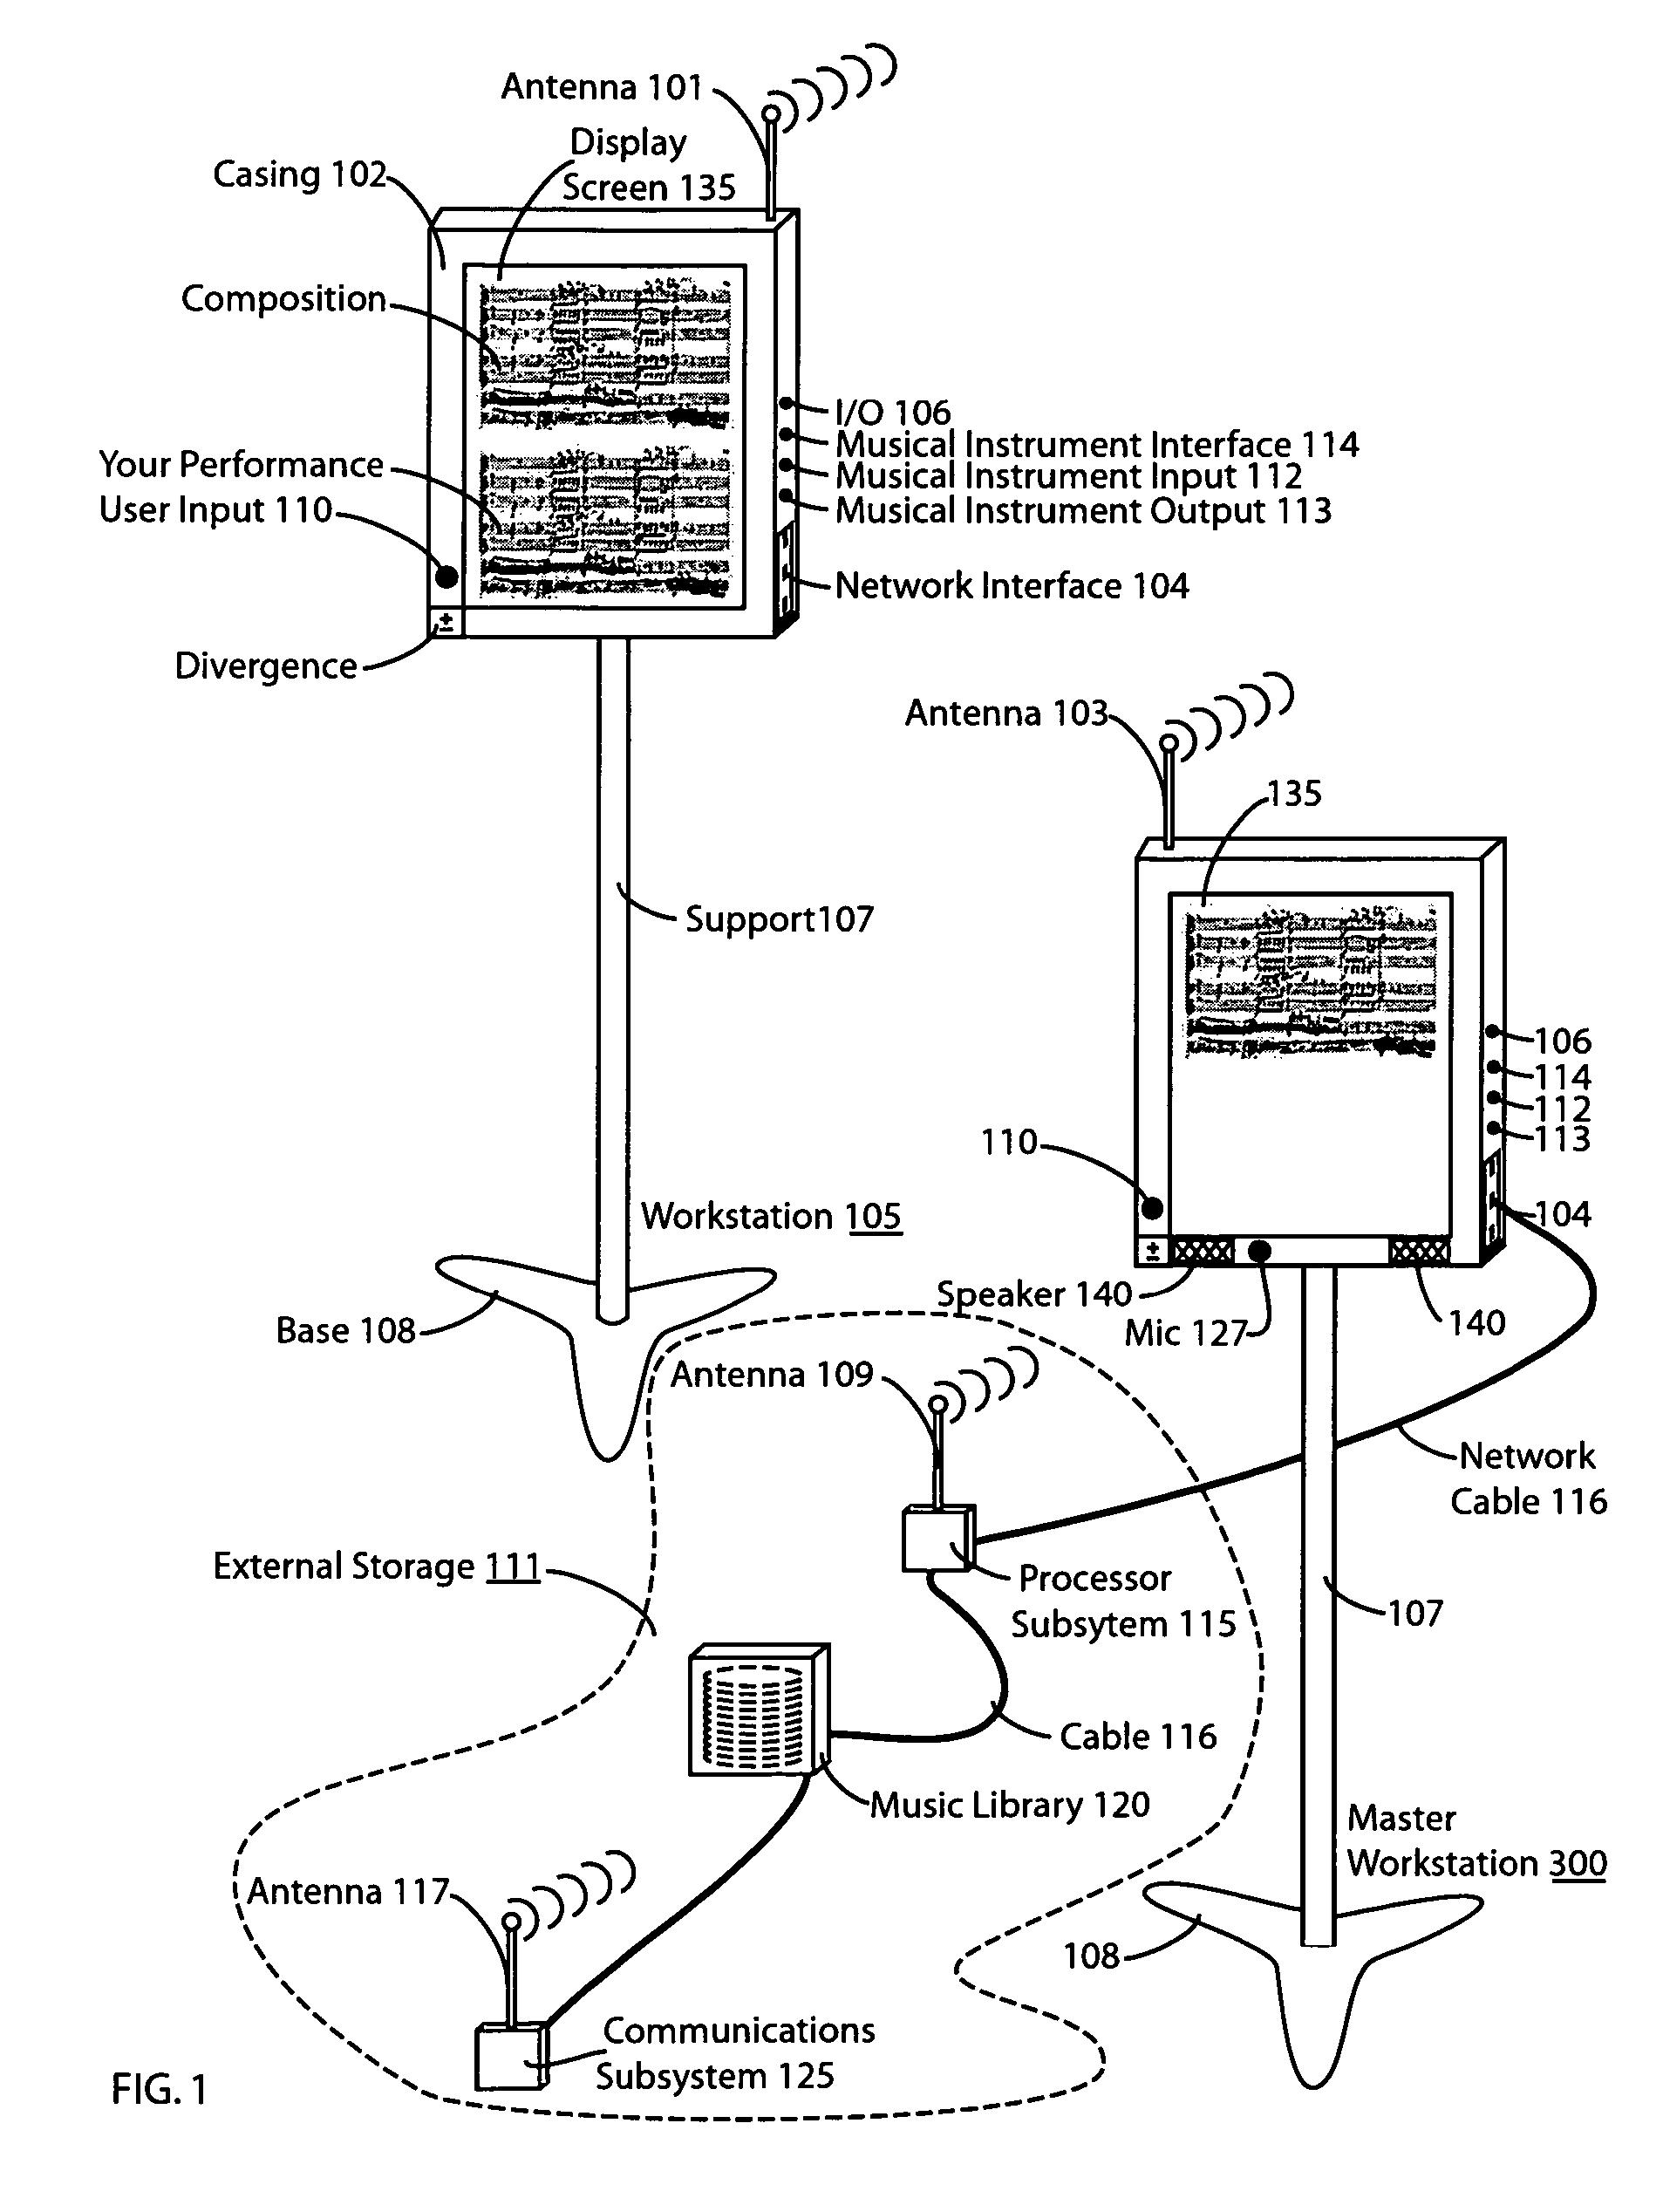 patent us 7 612 278 b2 Ladder Logic Diagram patent images patent images